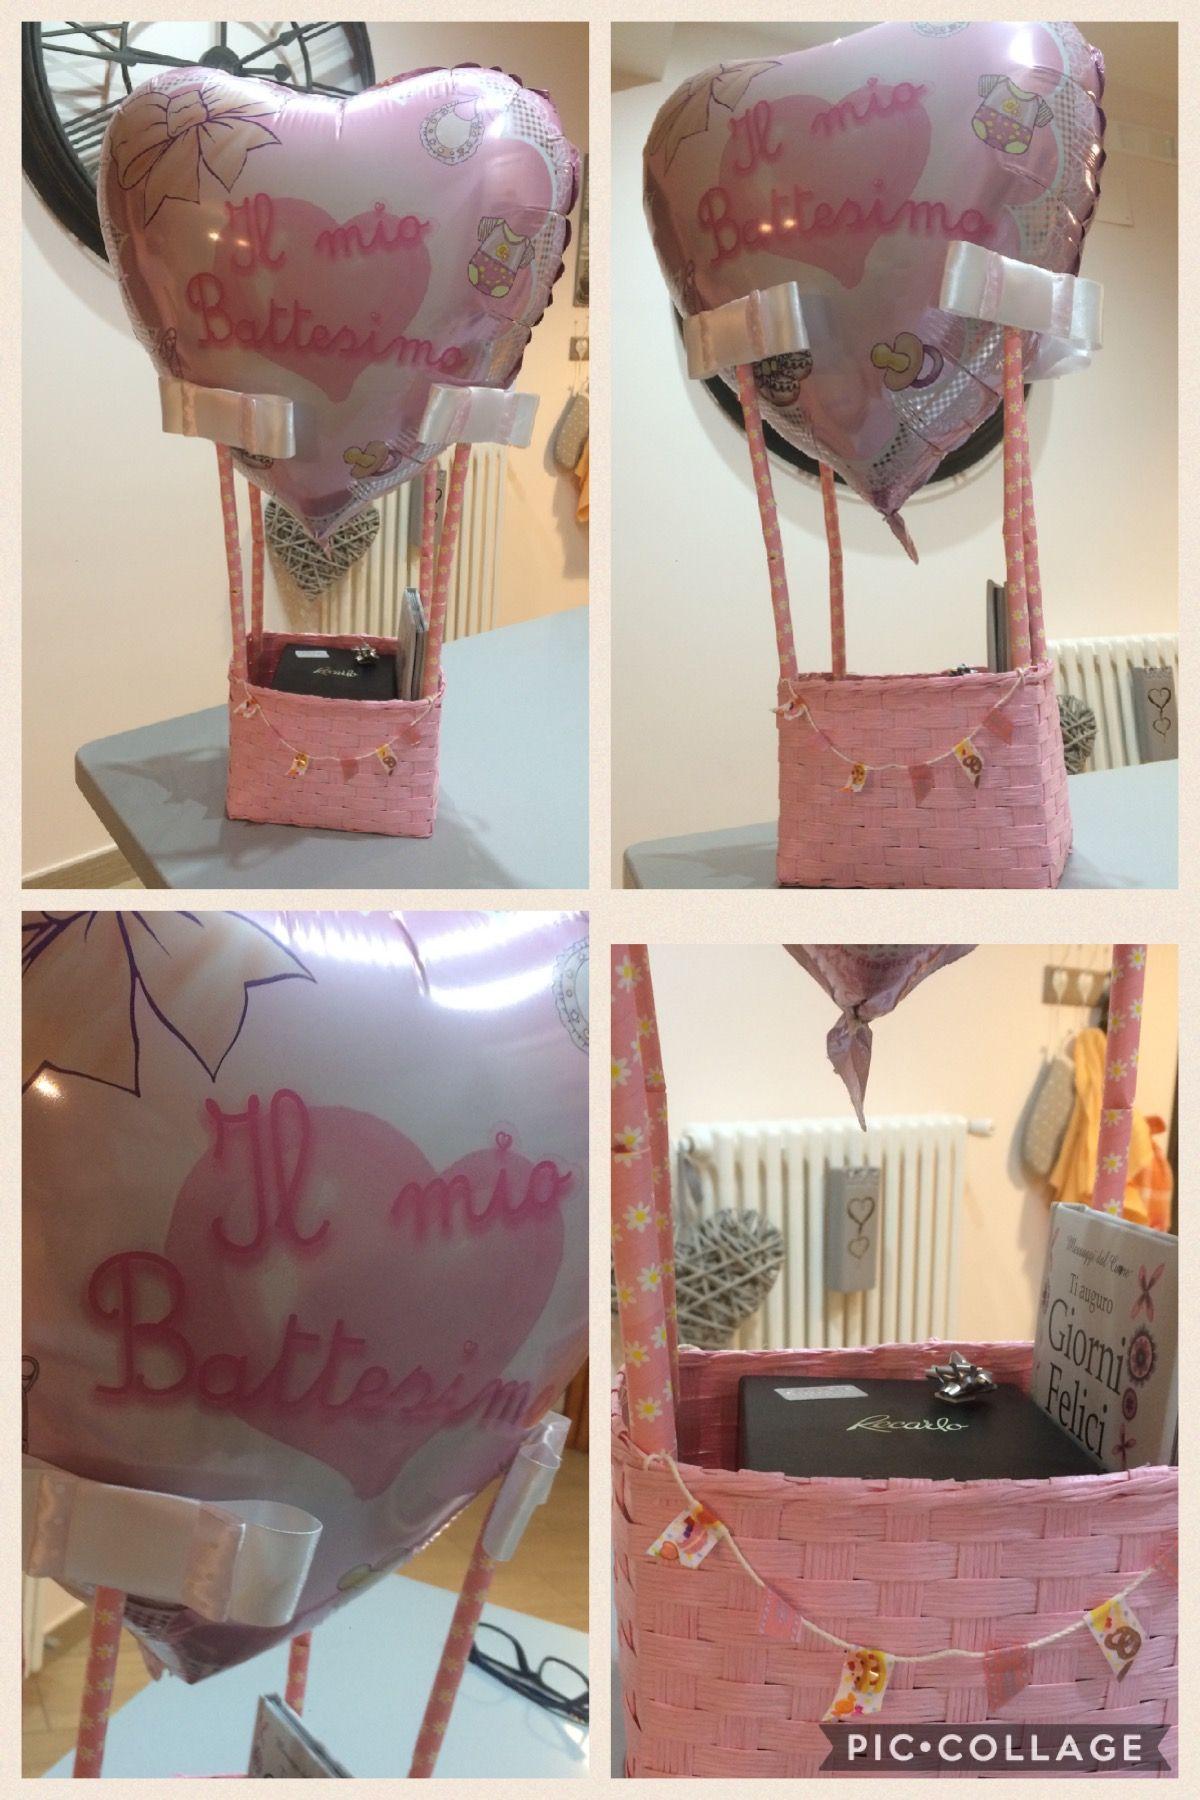 #mongolfiera#battesimo#portaconfetti#portaregalo#babygirl#pink#heart